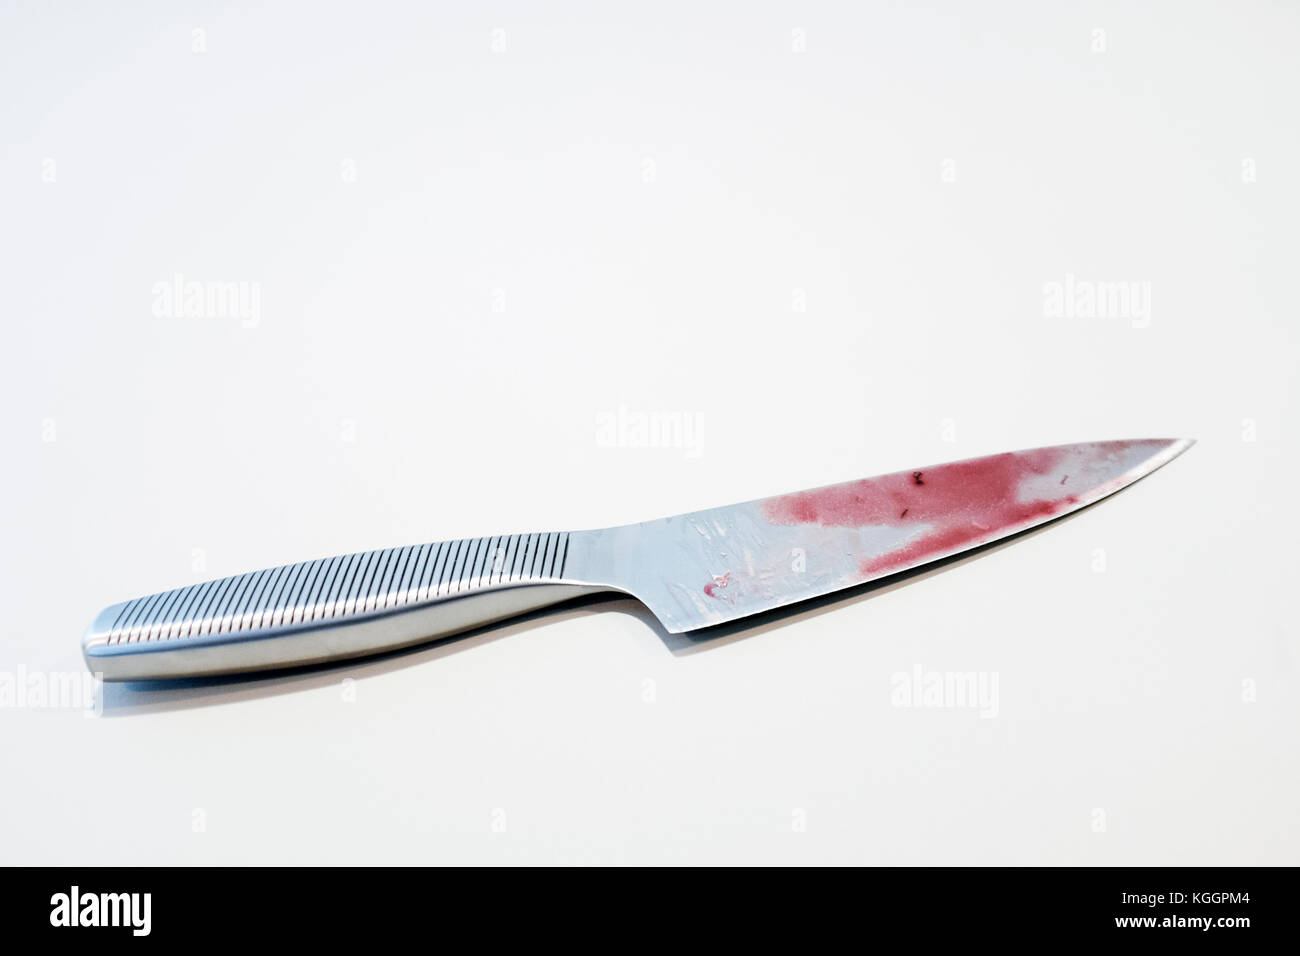 Bloody kitchen knife - Stock Image